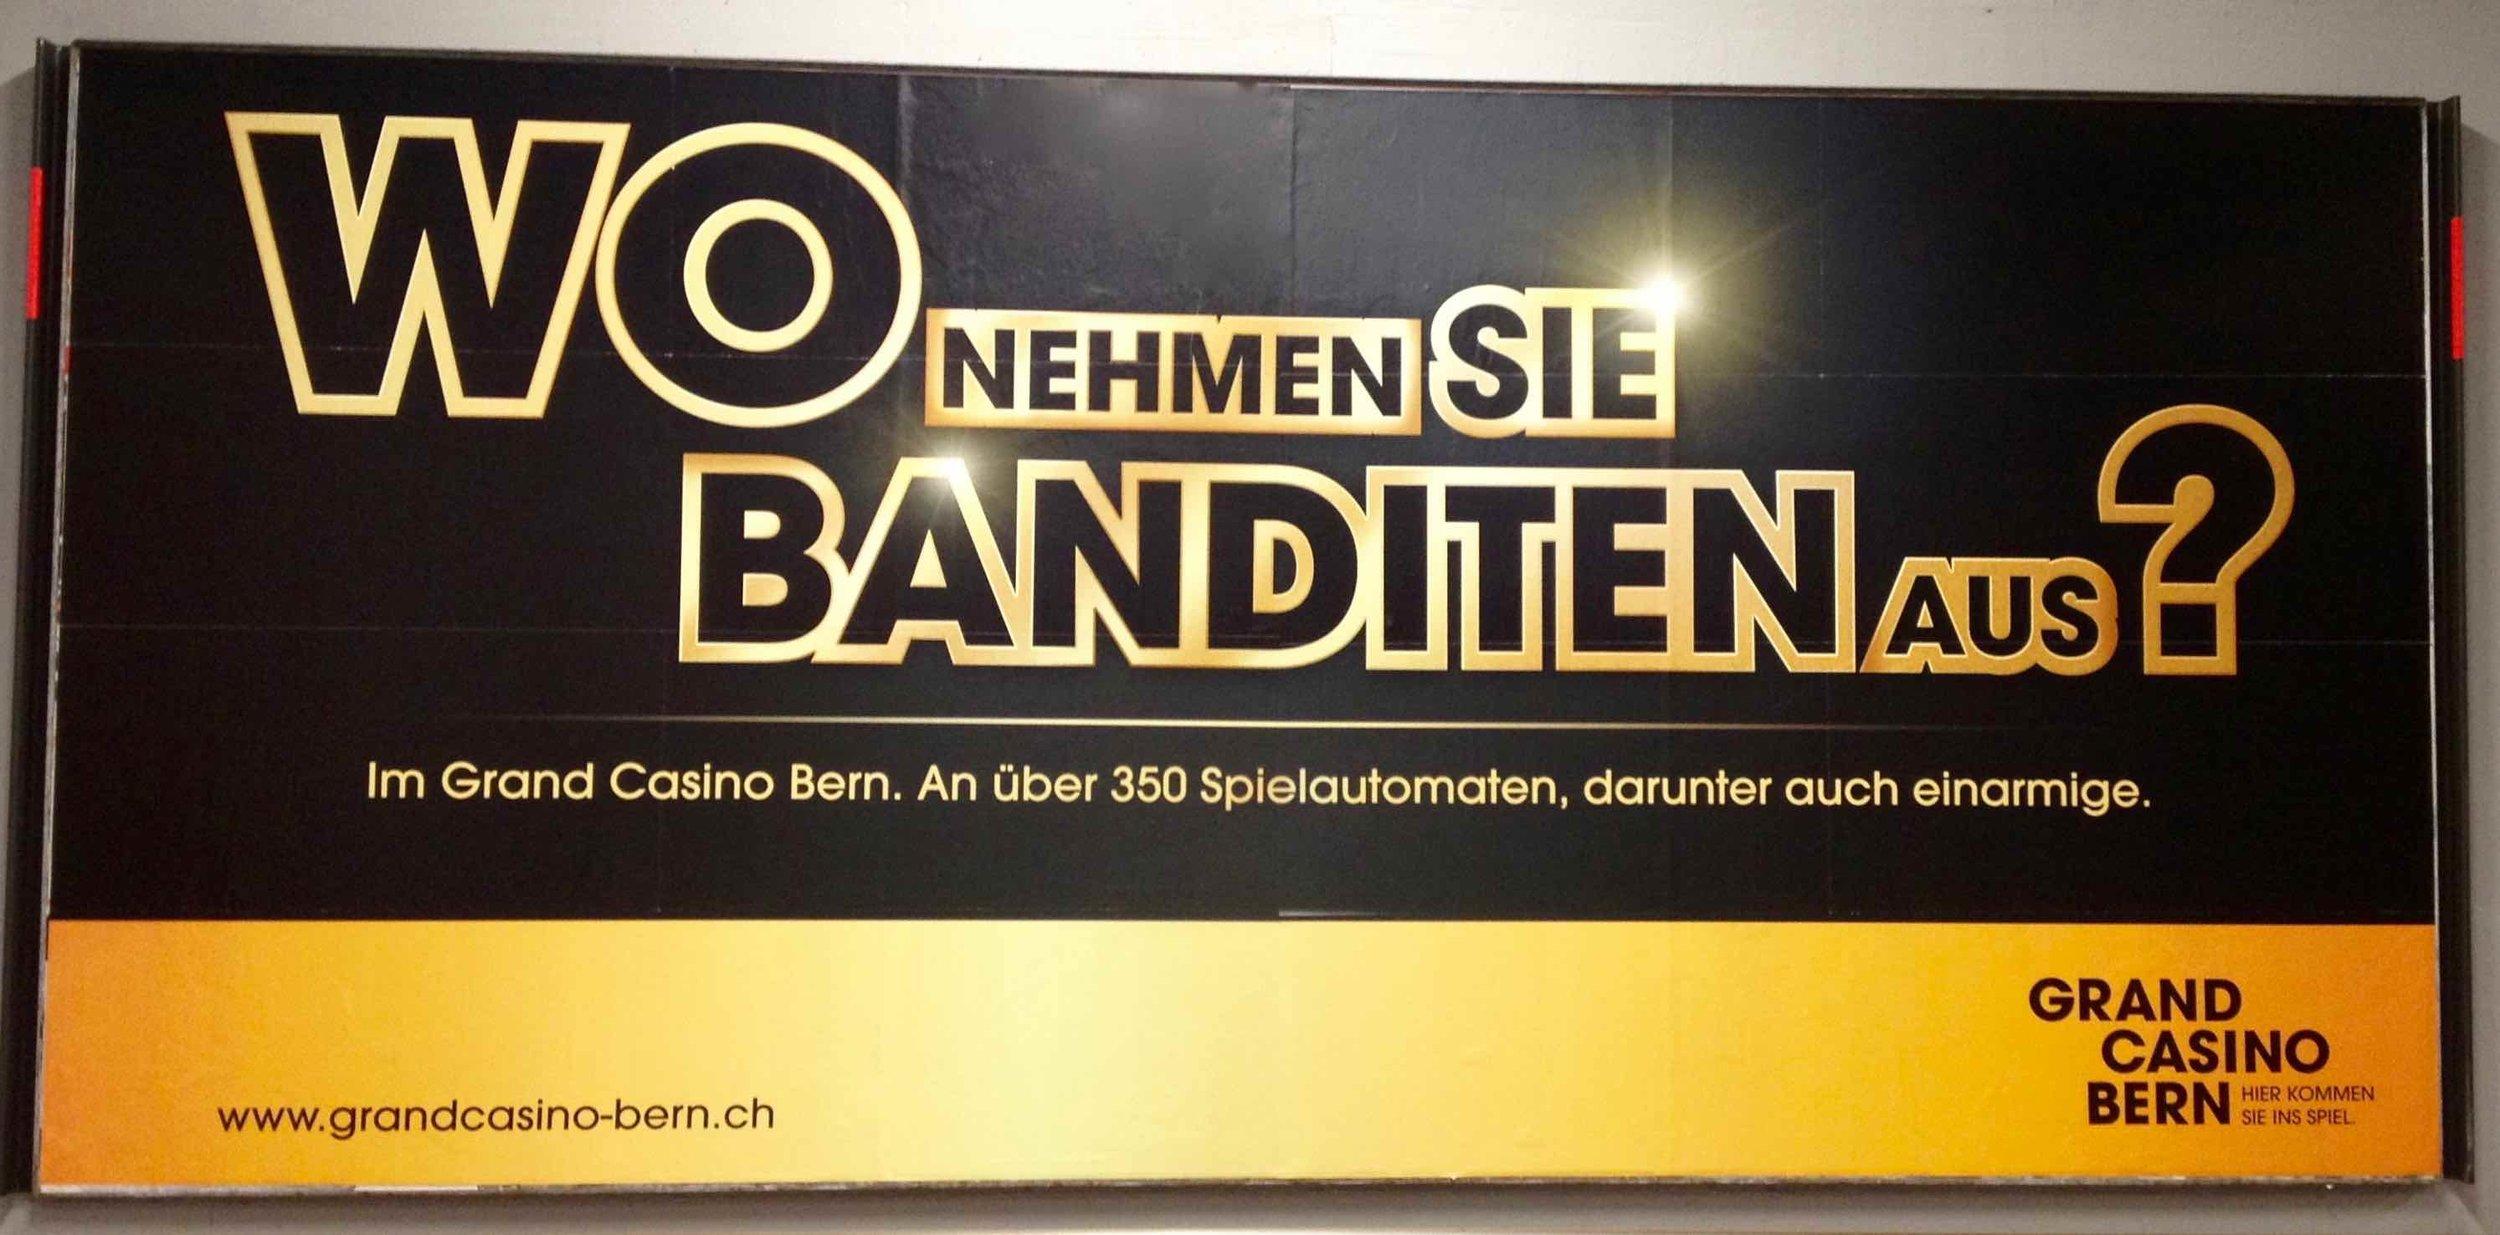 "Grand Casino Bern Imagekampagne 2013: Sujet ""Einarmige Banditen"""